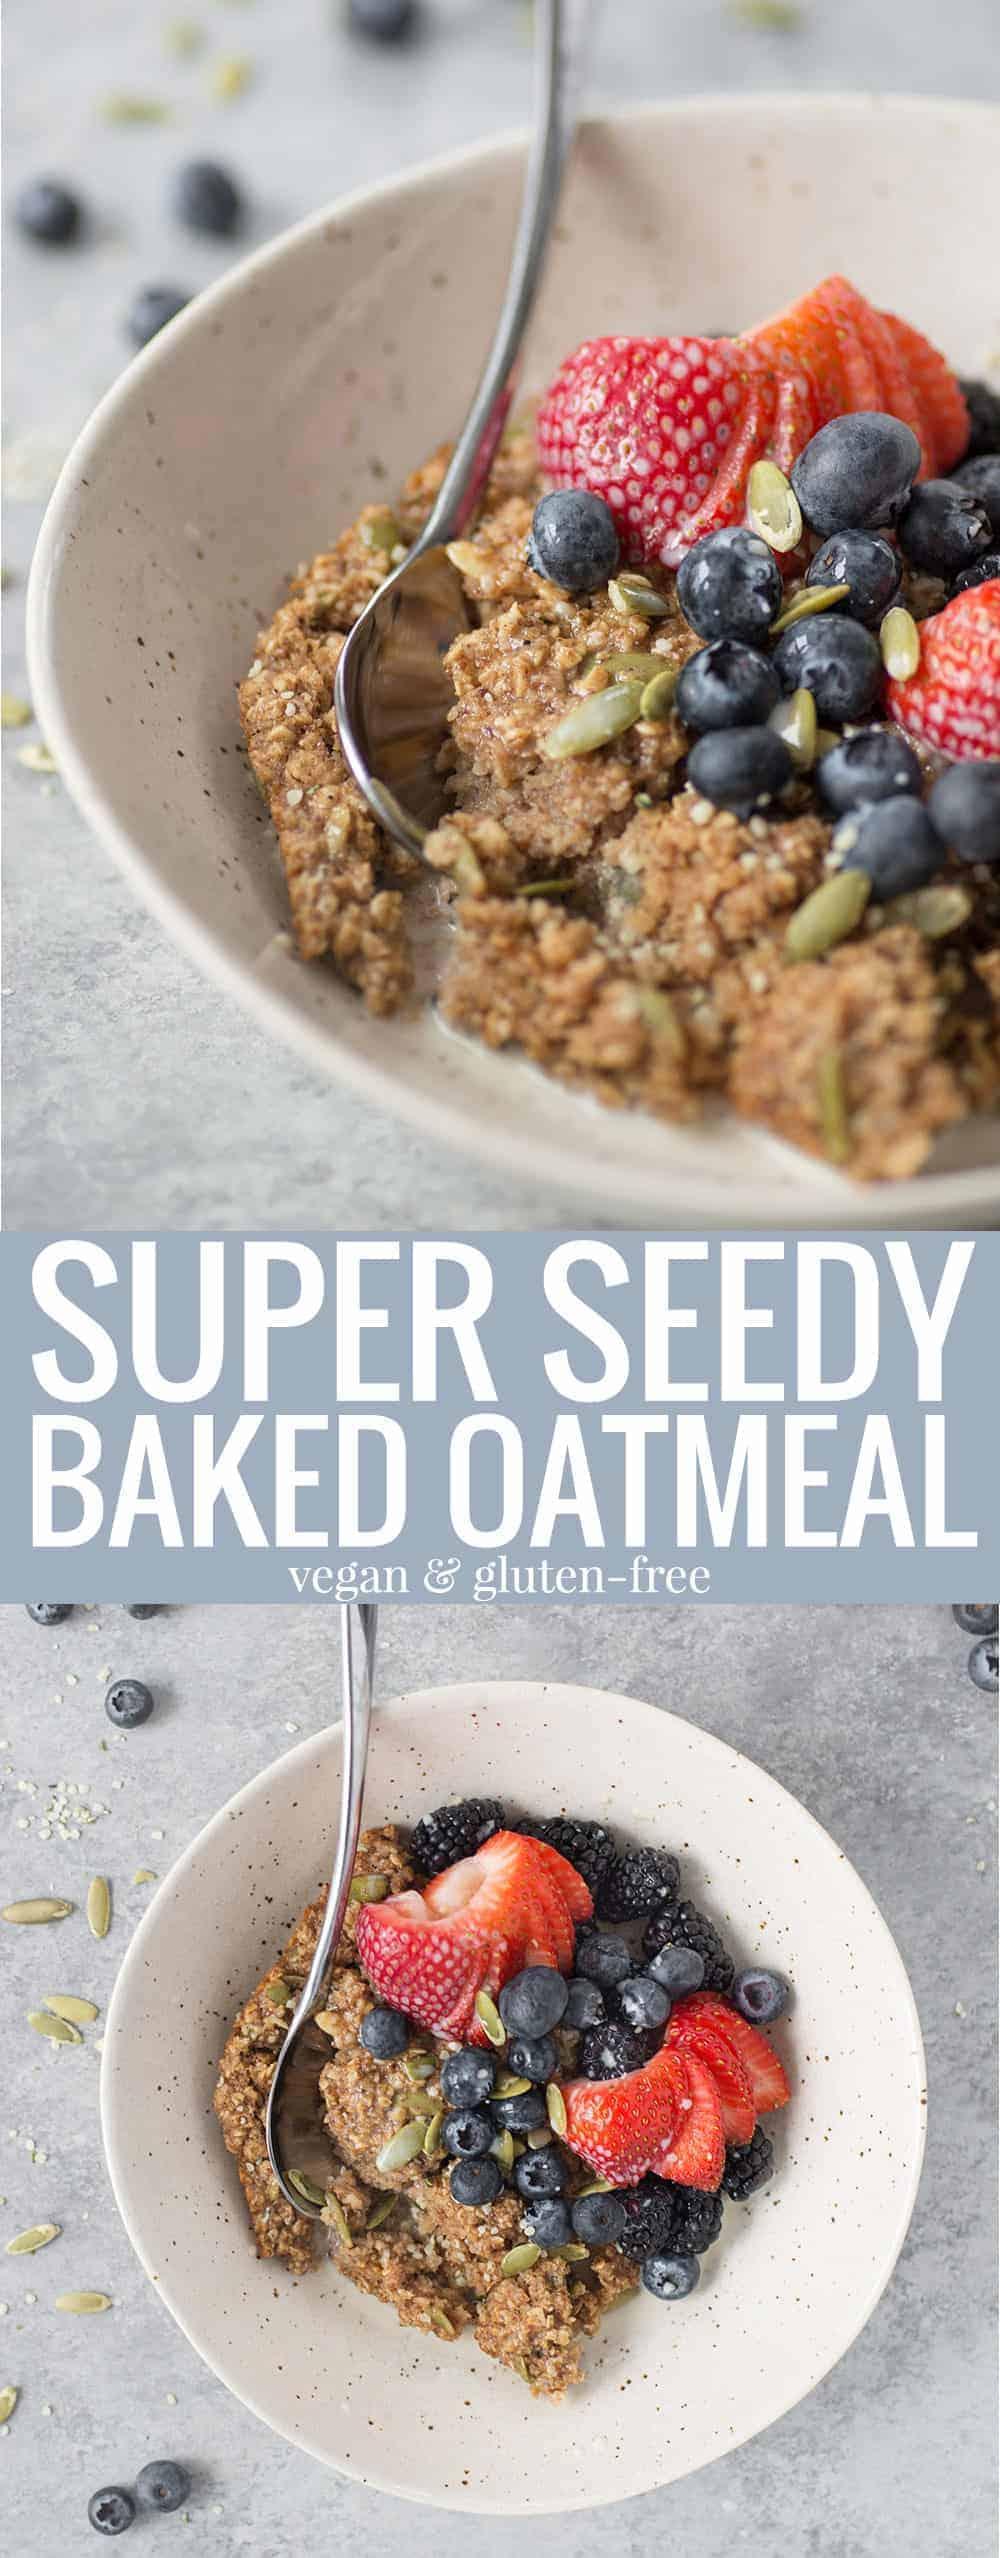 super seedy baked oatmeal recipe